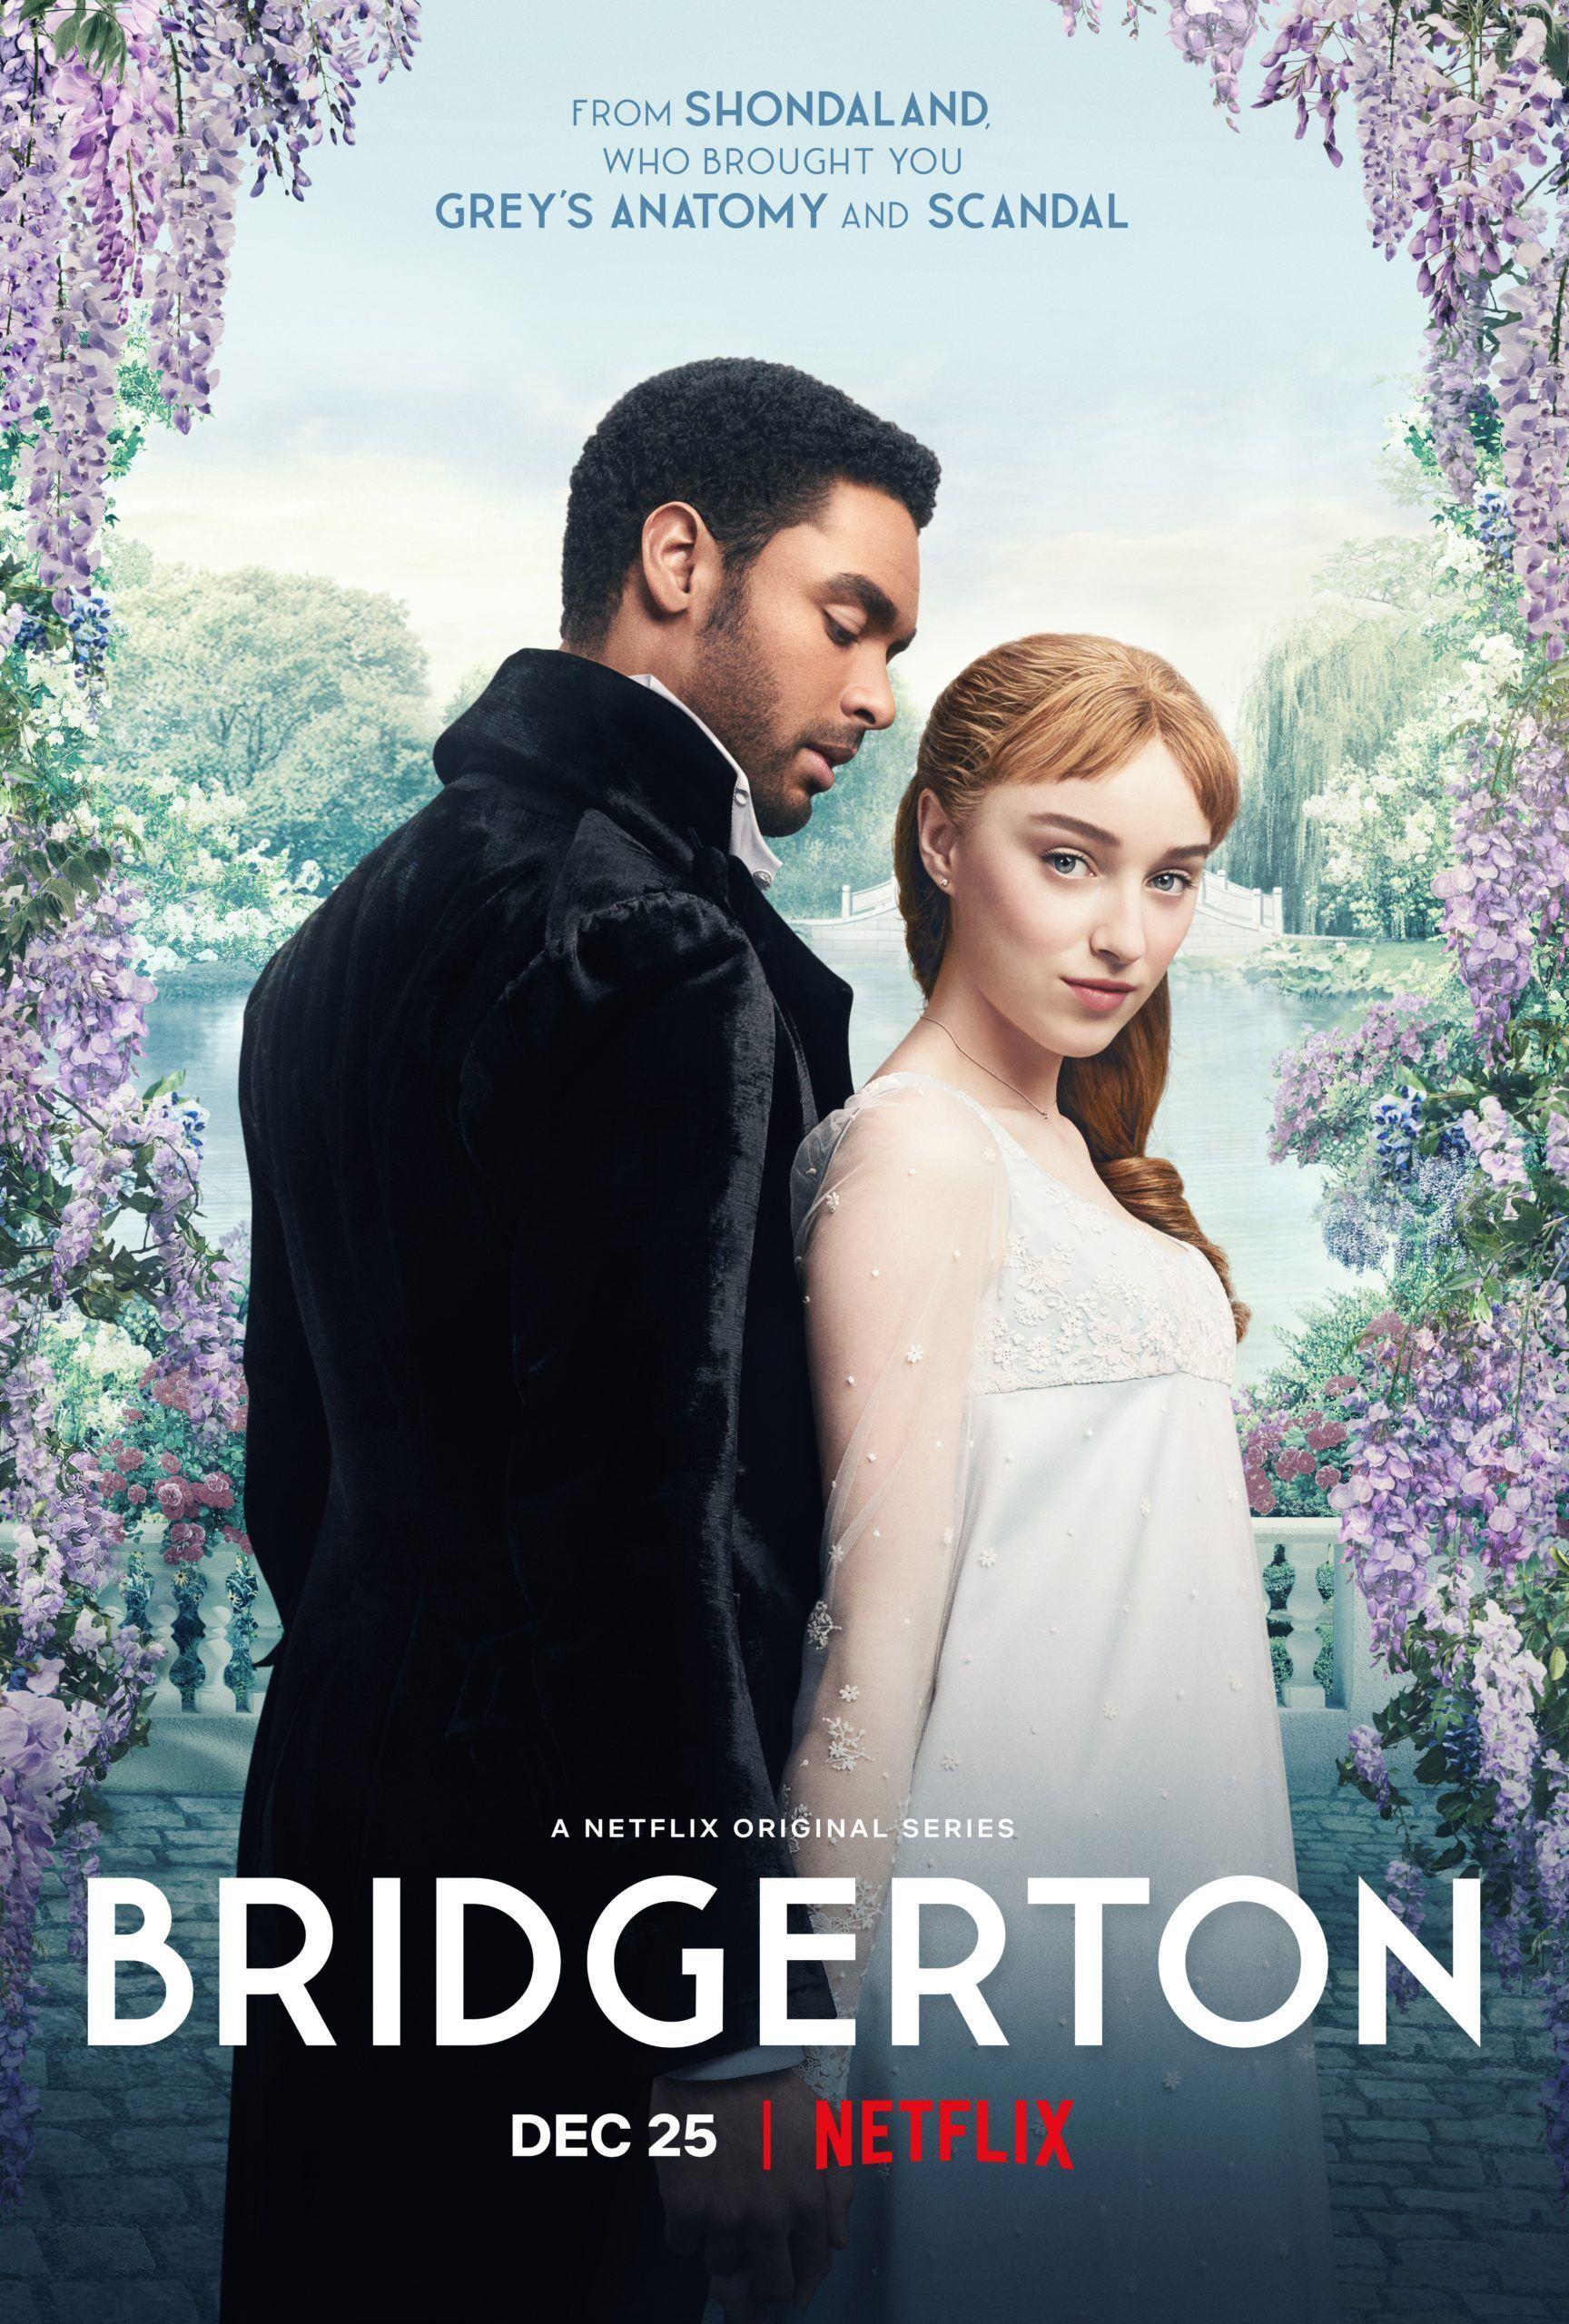 Teaser Trailer For Netflix Original Series 'Bridge